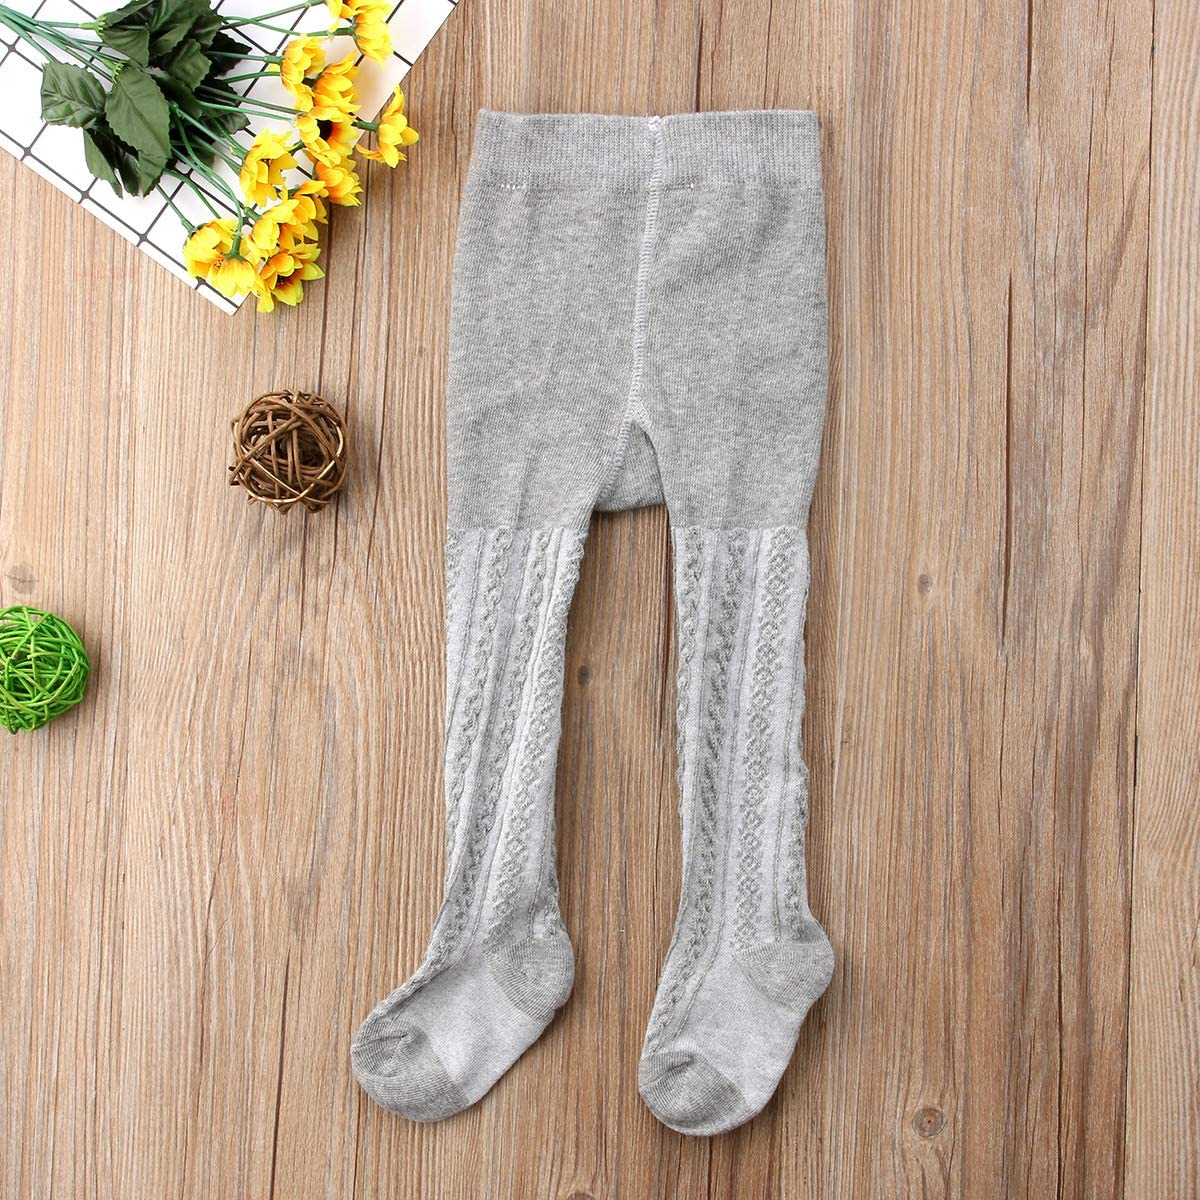 WANGSAURA Baby-M/ädchen Strumpfhose 3 Paar Set Cable Warme Leggings Kinderstrumpfhose